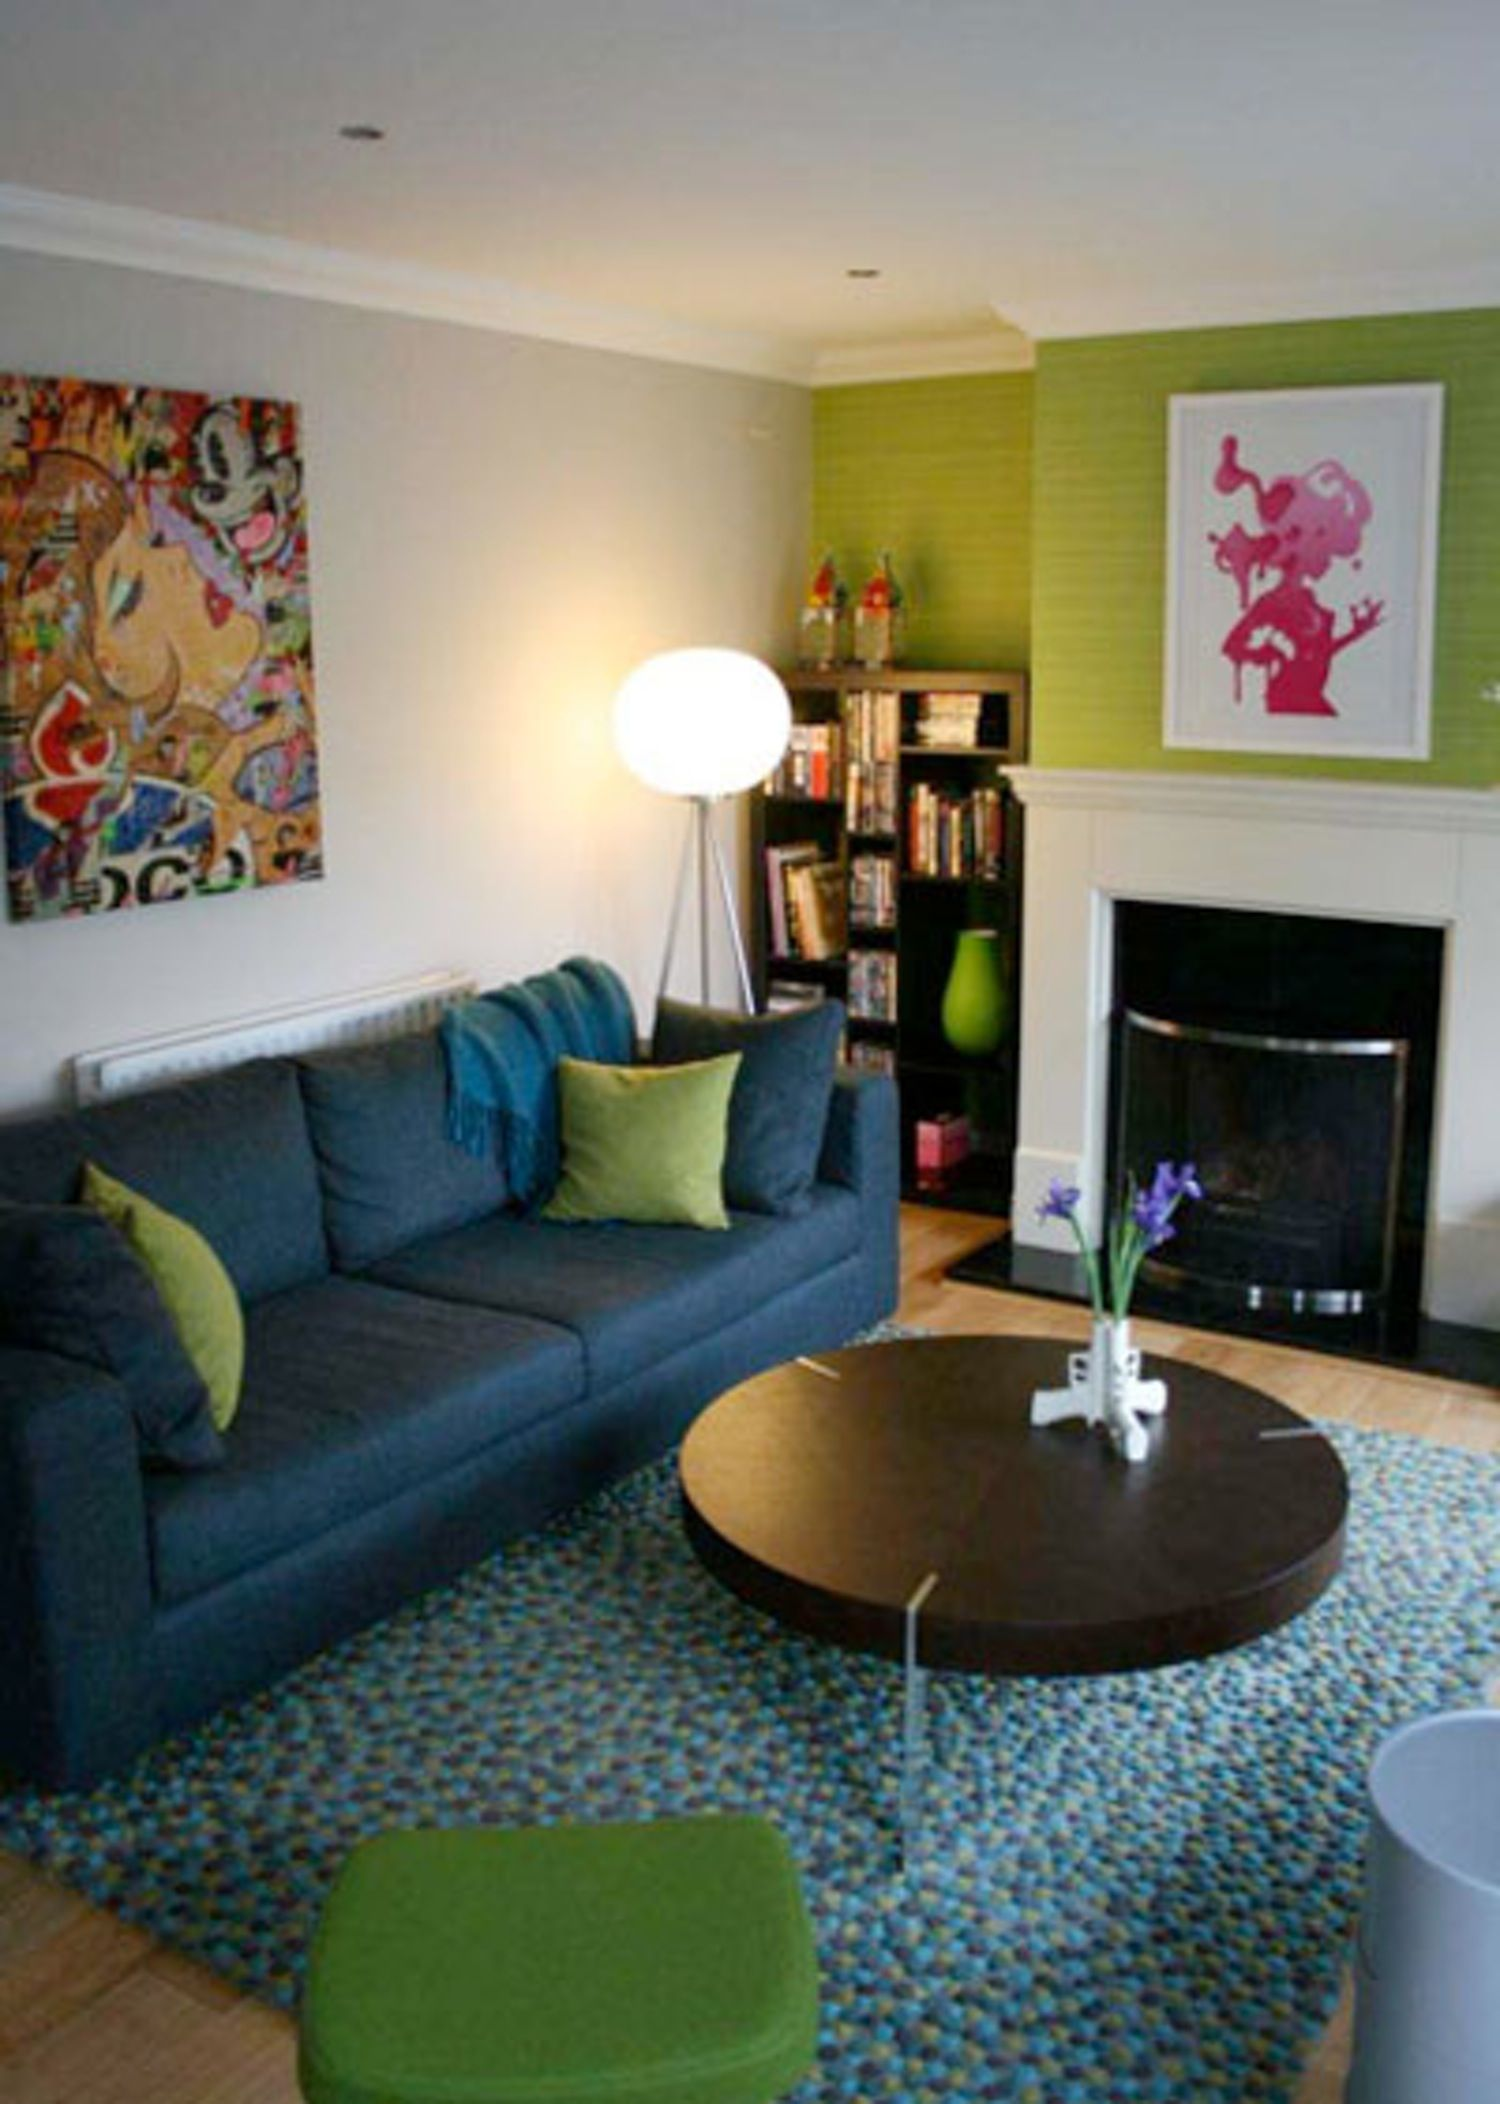 Joanne S Lime Teal Living Room Teal Living Rooms Living Room Green Living Room Decor #teal #and #lime #green #living #room